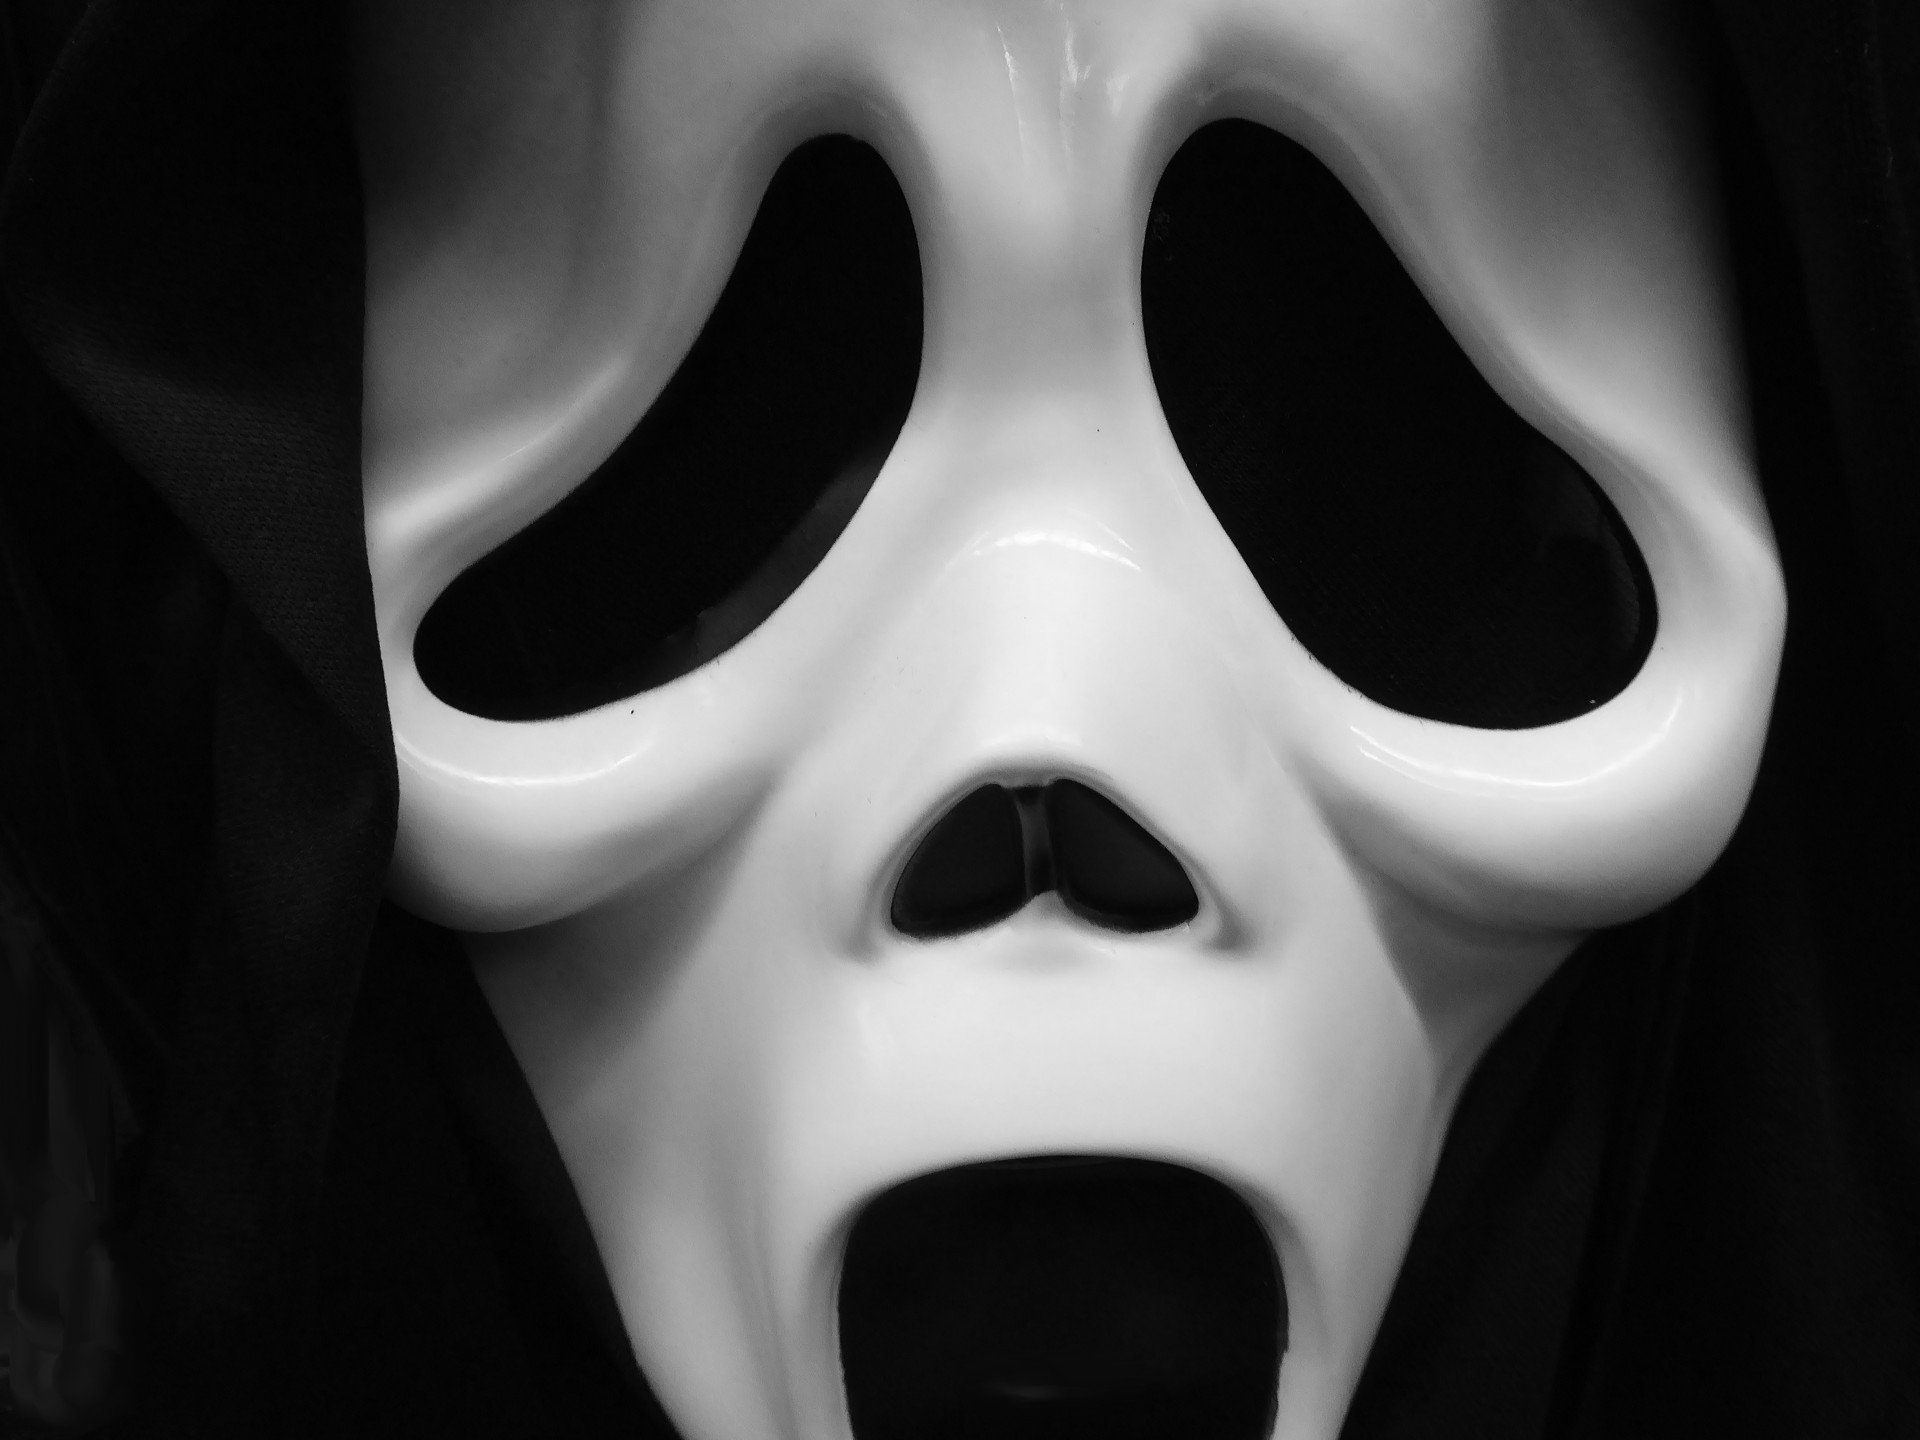 Ghostface Serial Killer Real Life Scream Mask Murders Kids